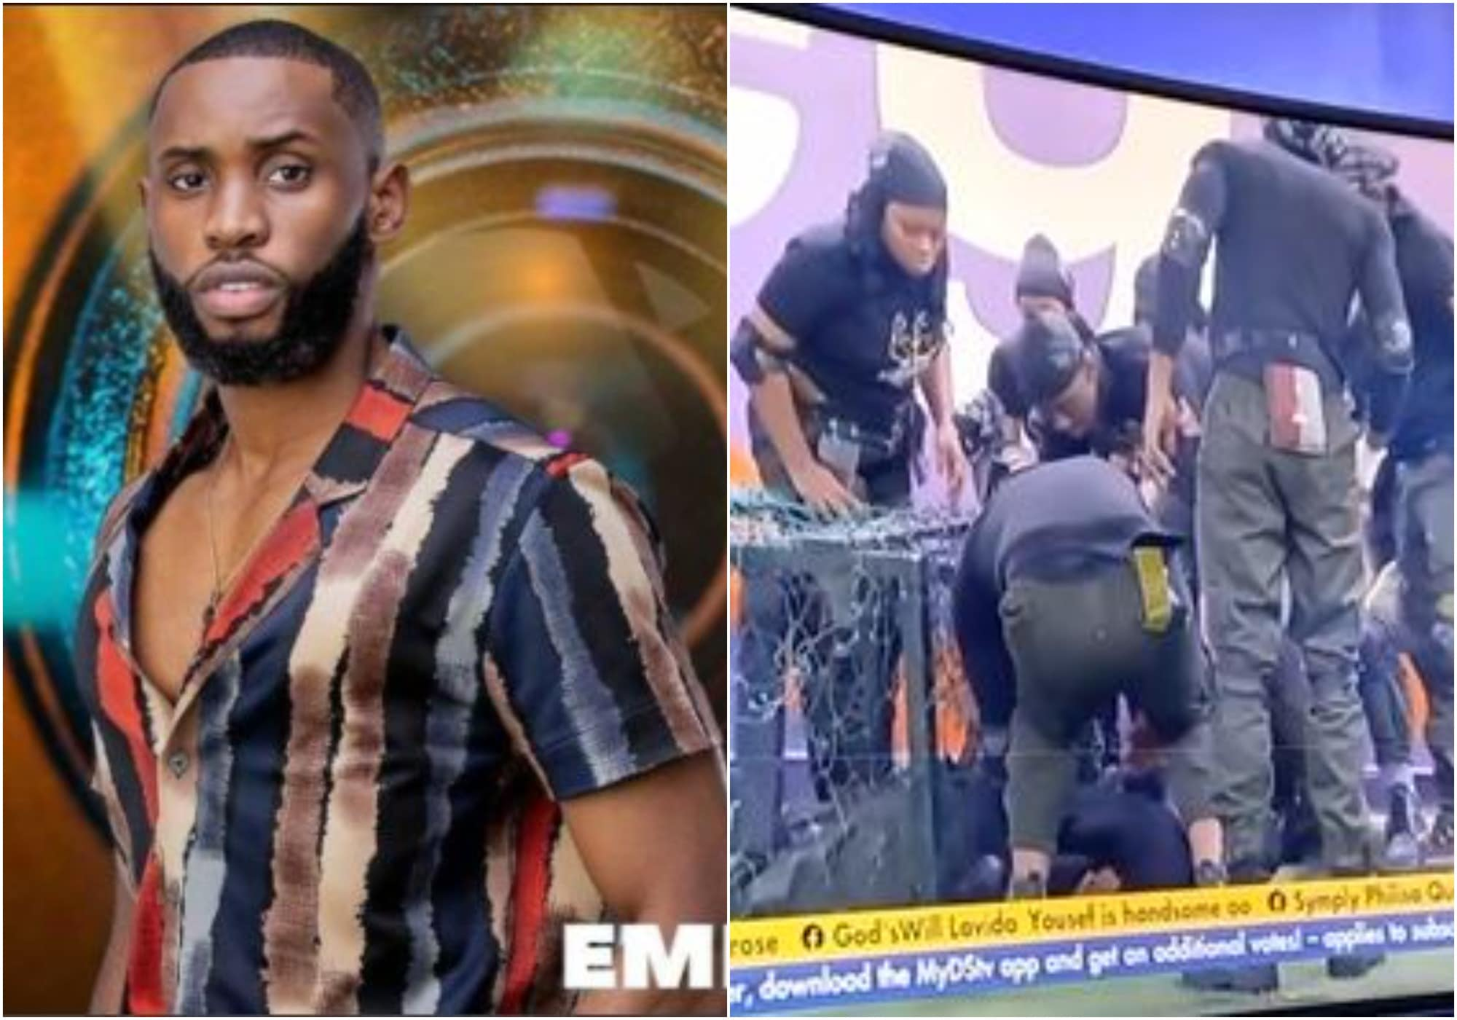 BBNaija housemate Emmanuel sustains injury